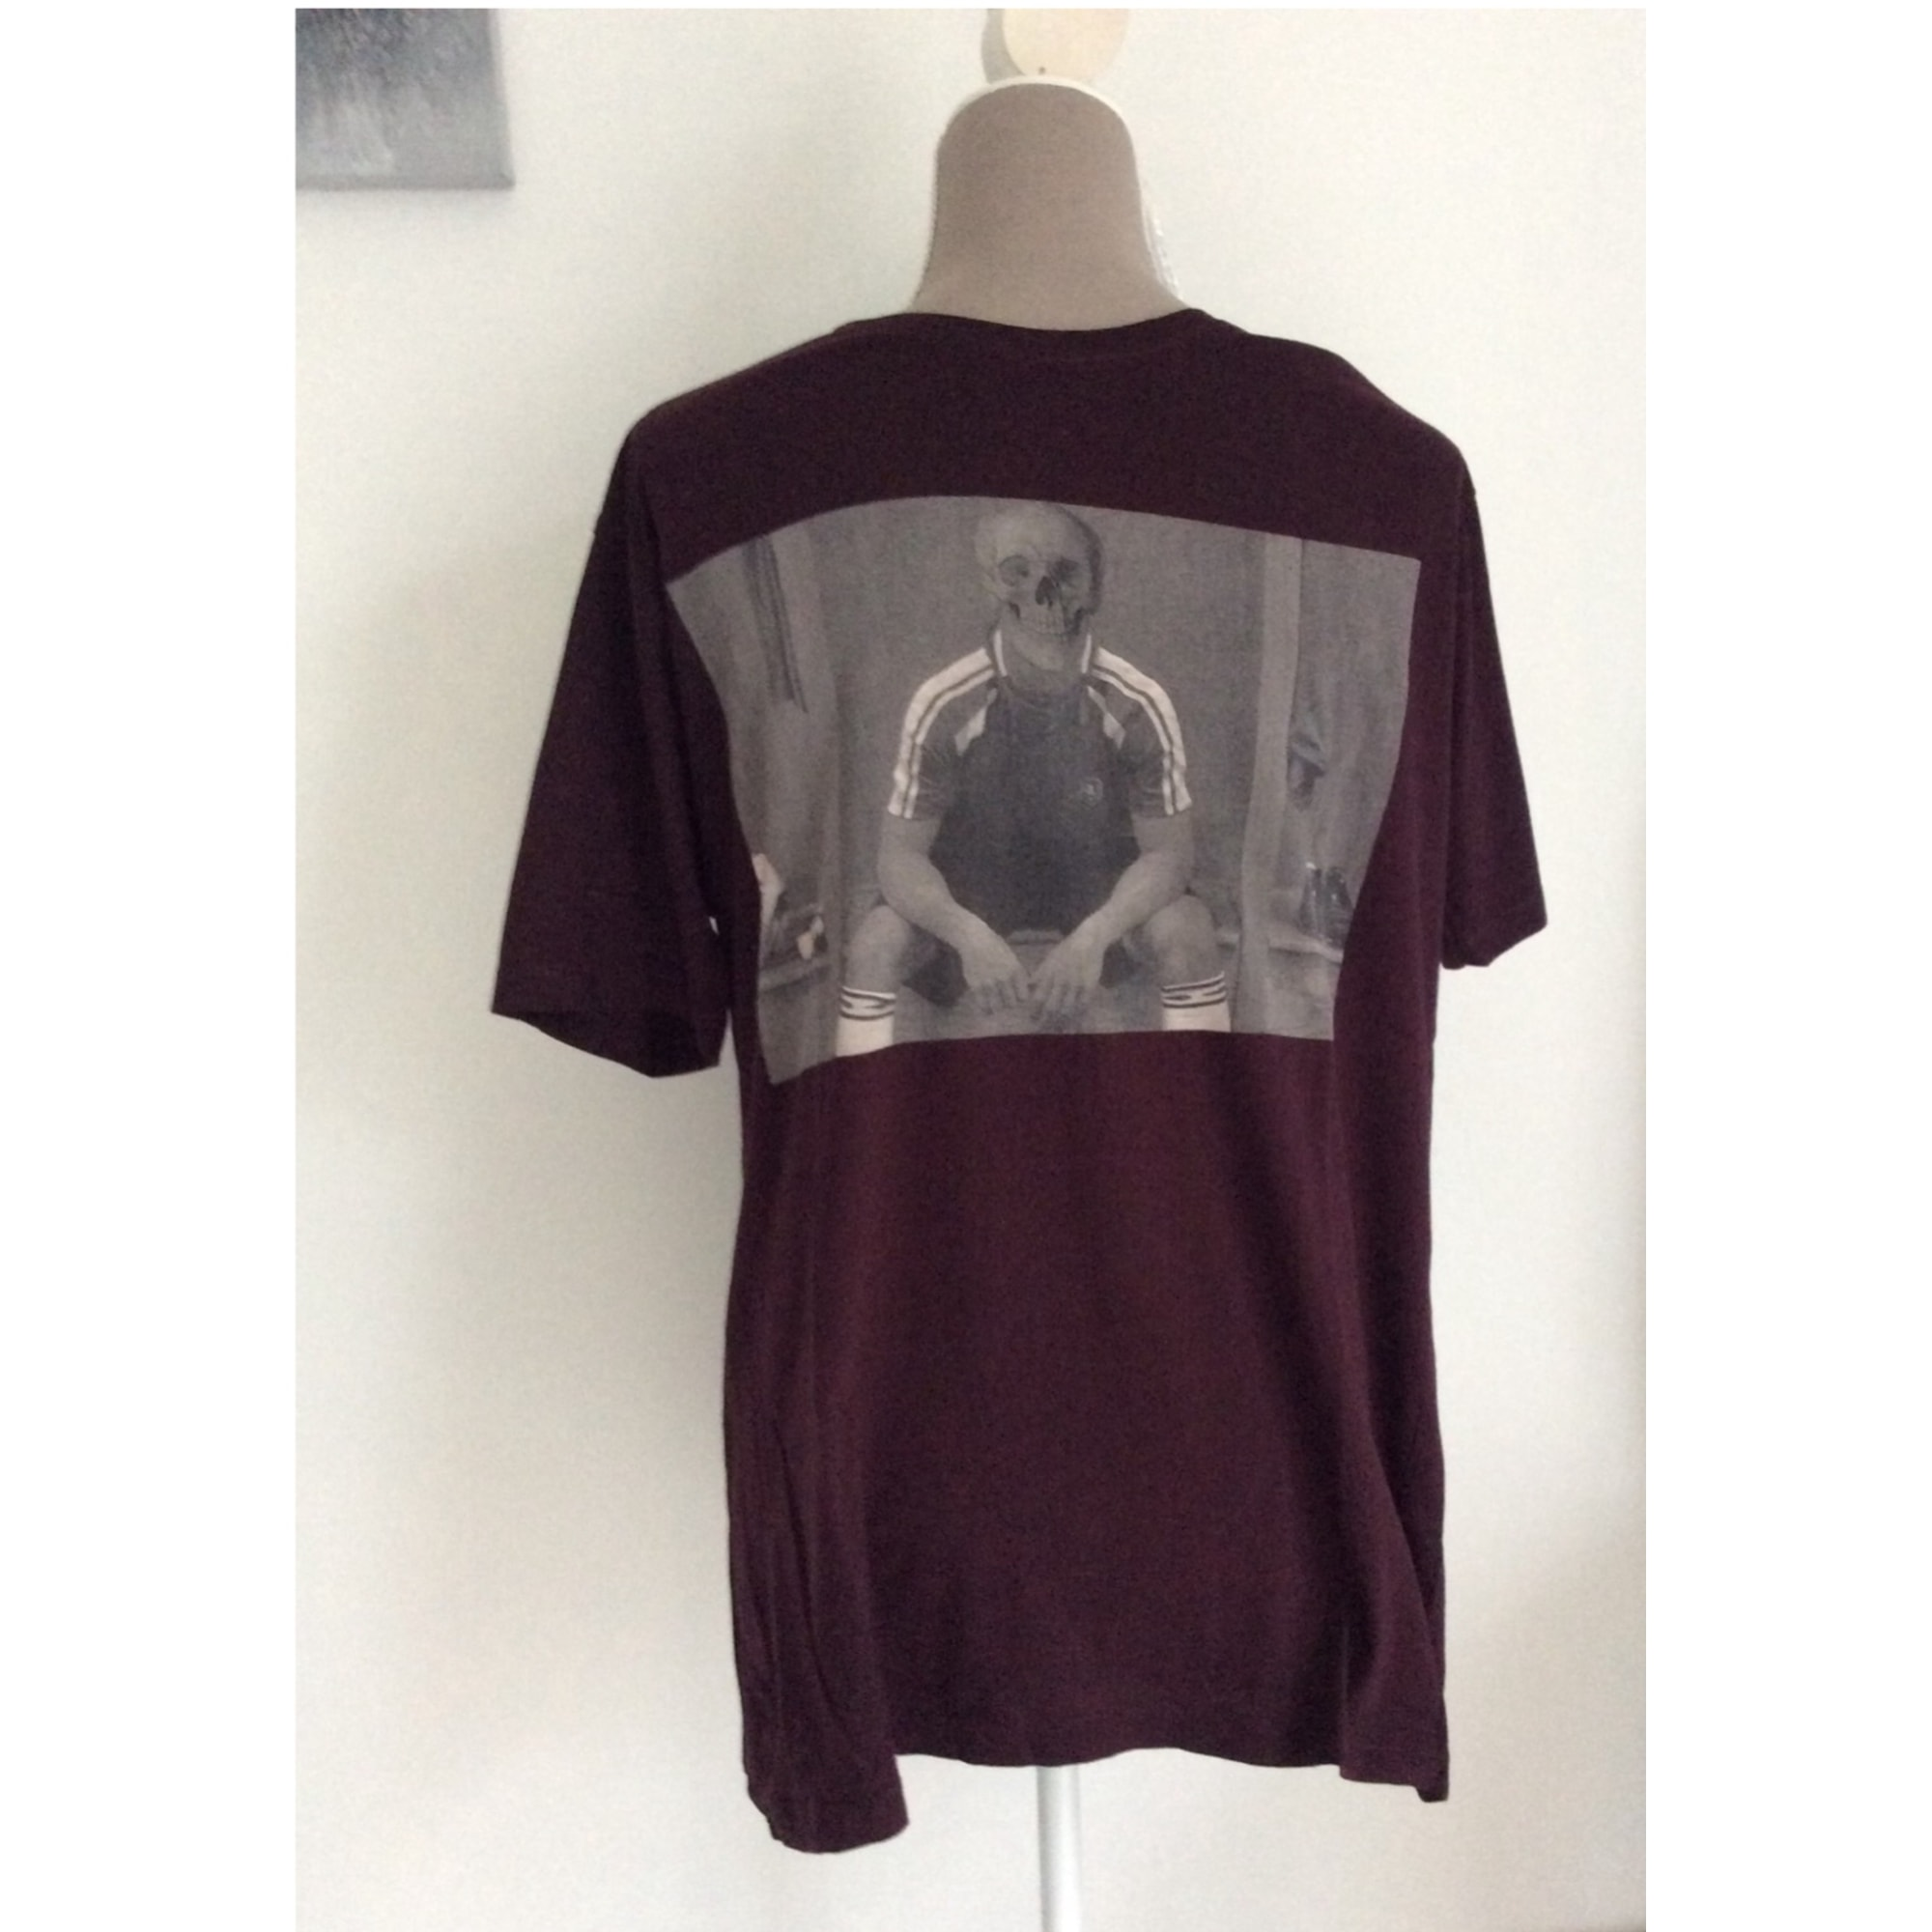 Tee-shirt THE KOOPLES Violet, mauve, lavande